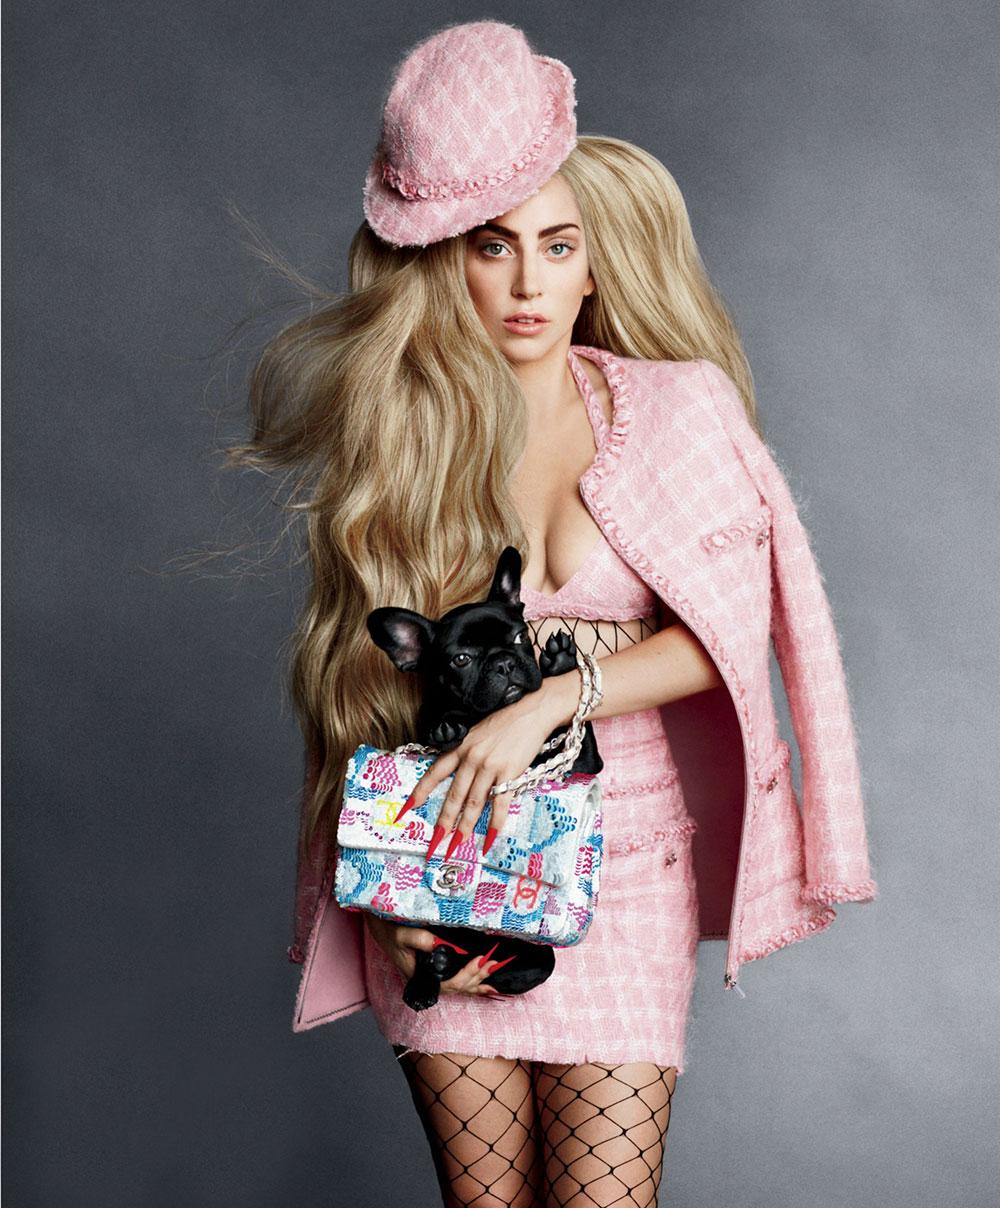 LADY GAGA for Harper's Bazaar Magazine